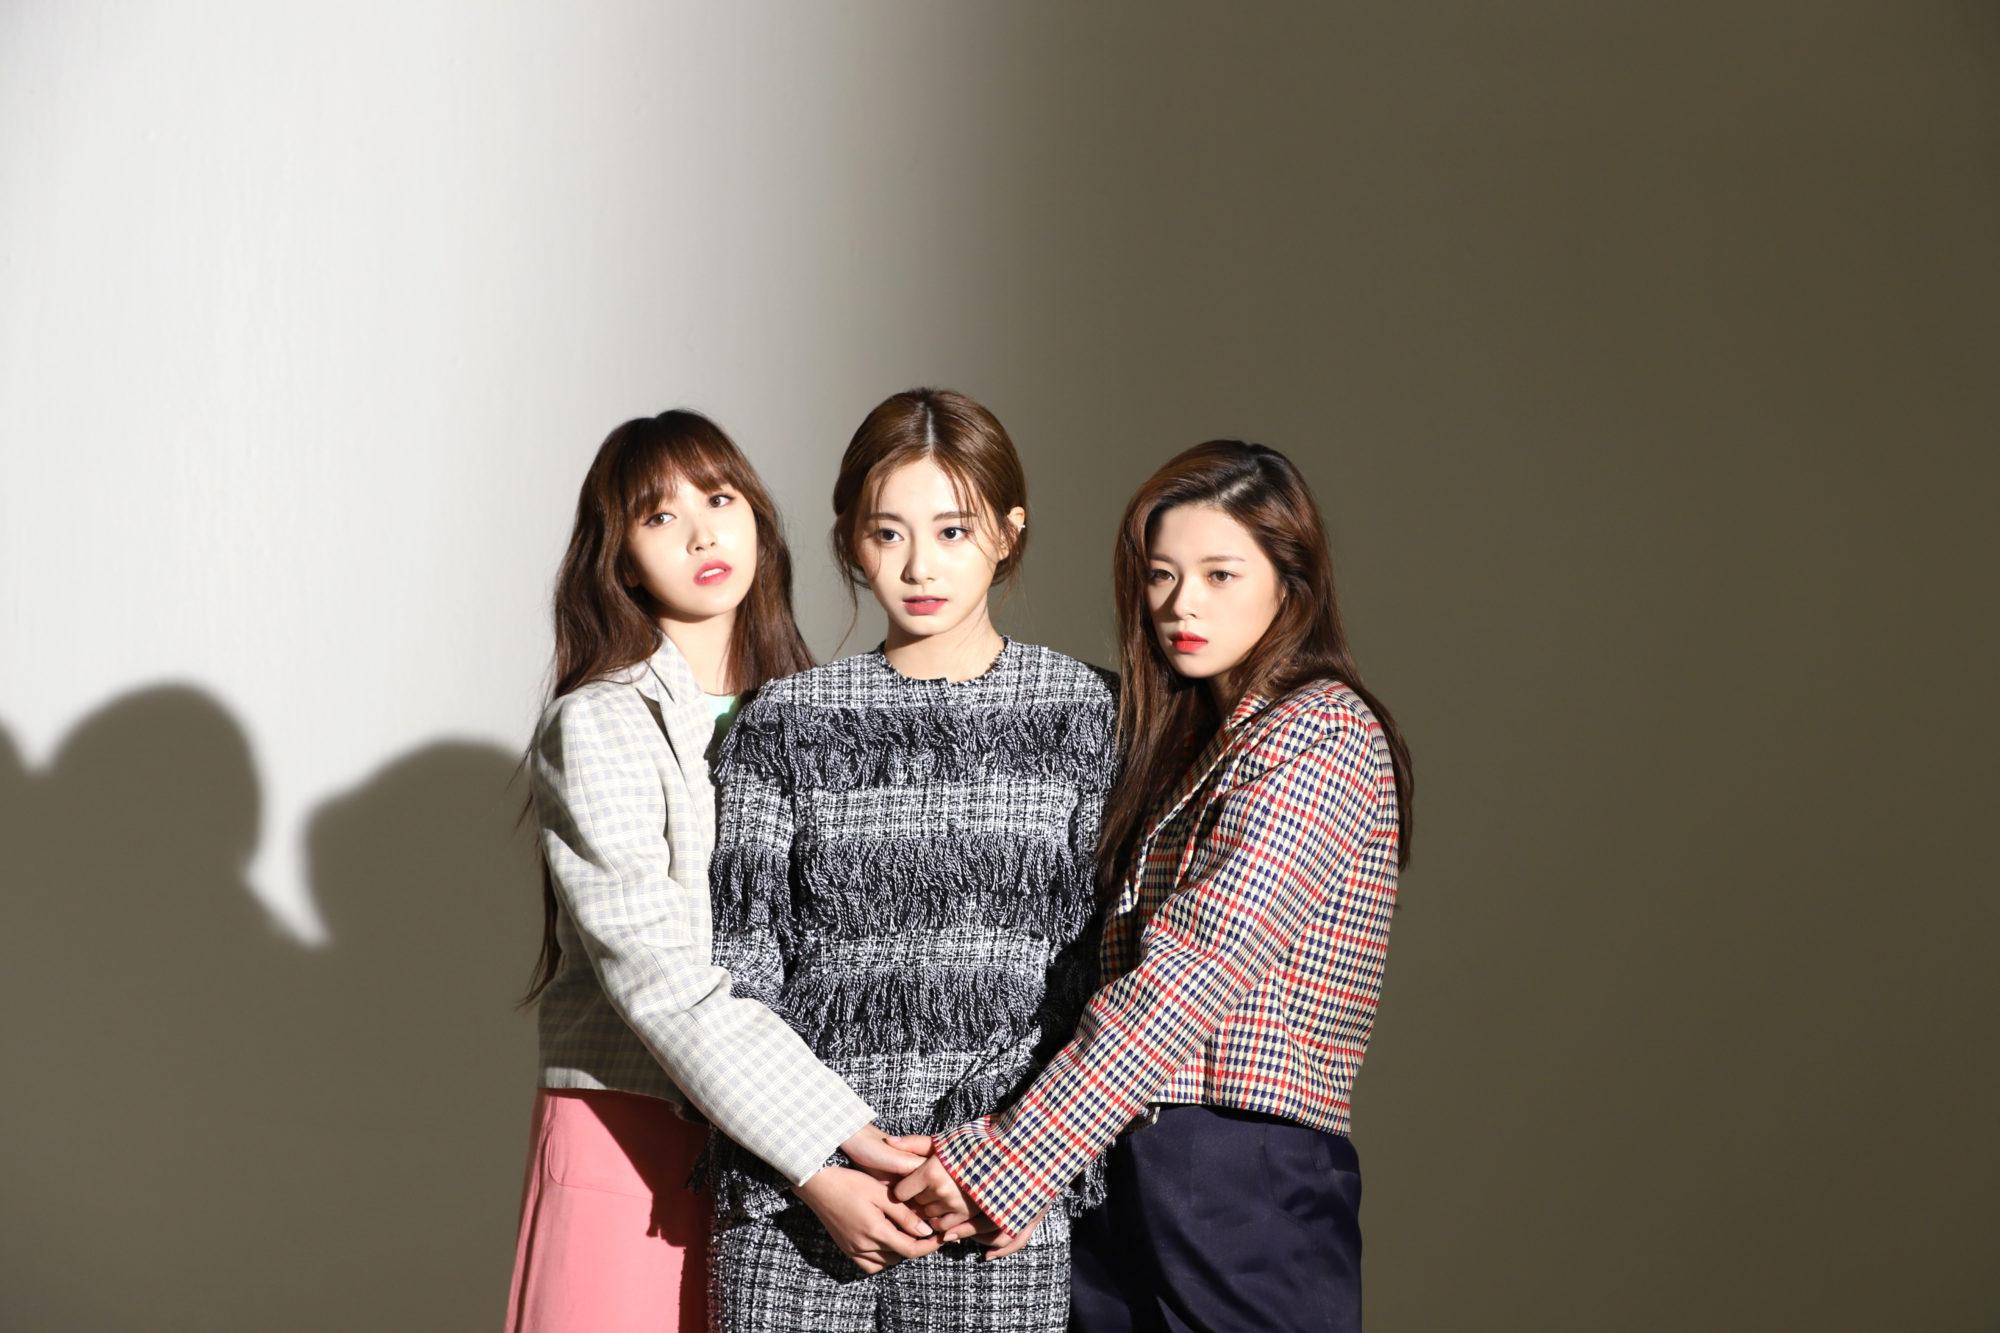 Twice Allure Mina Tzuyu Jeongyeon 2019 HD